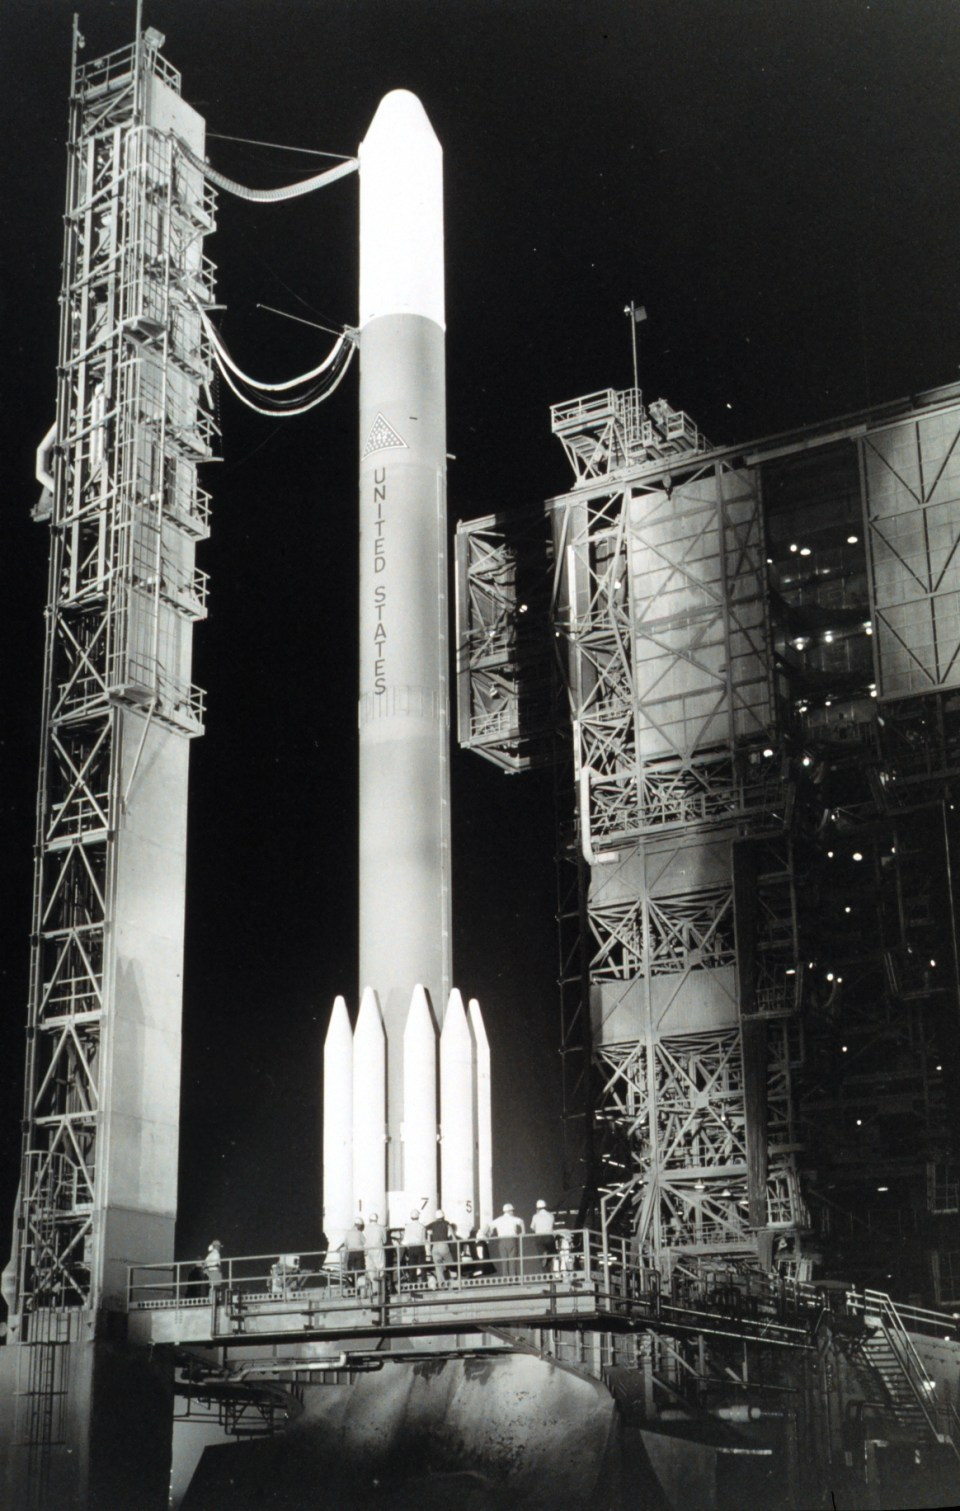 GOES-C_awaits_launch_Spac0236